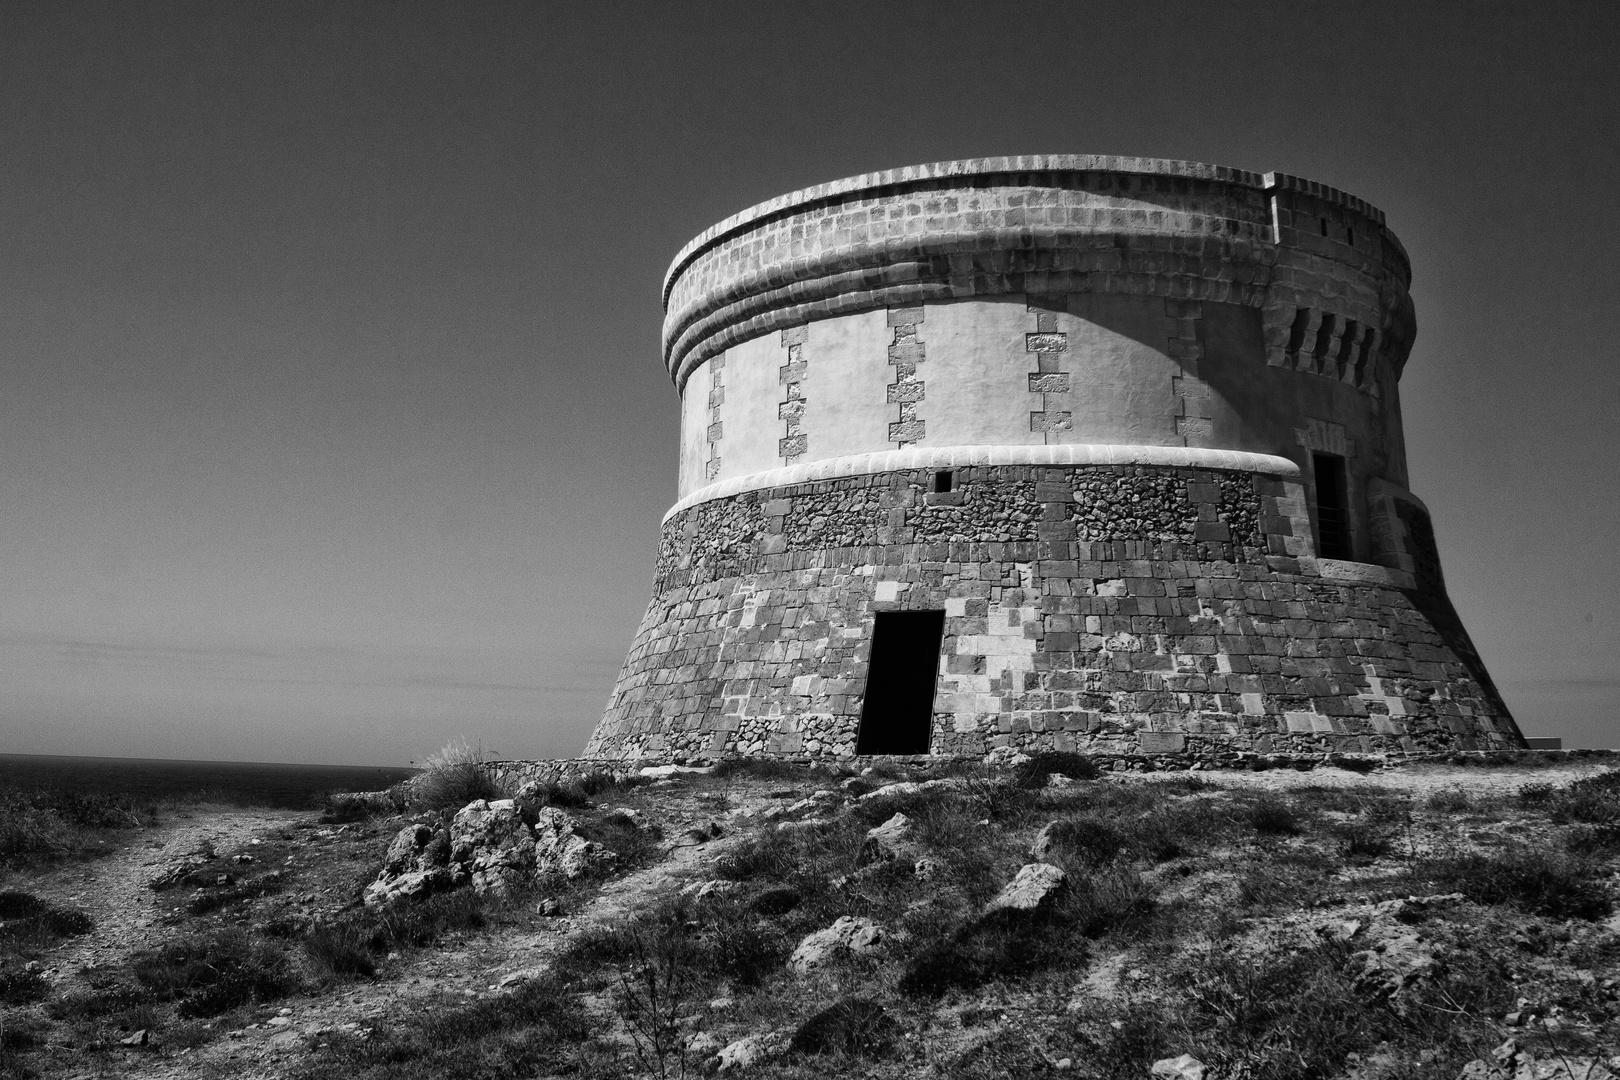 Menorca Impressionen - Torre de Fornells (198)